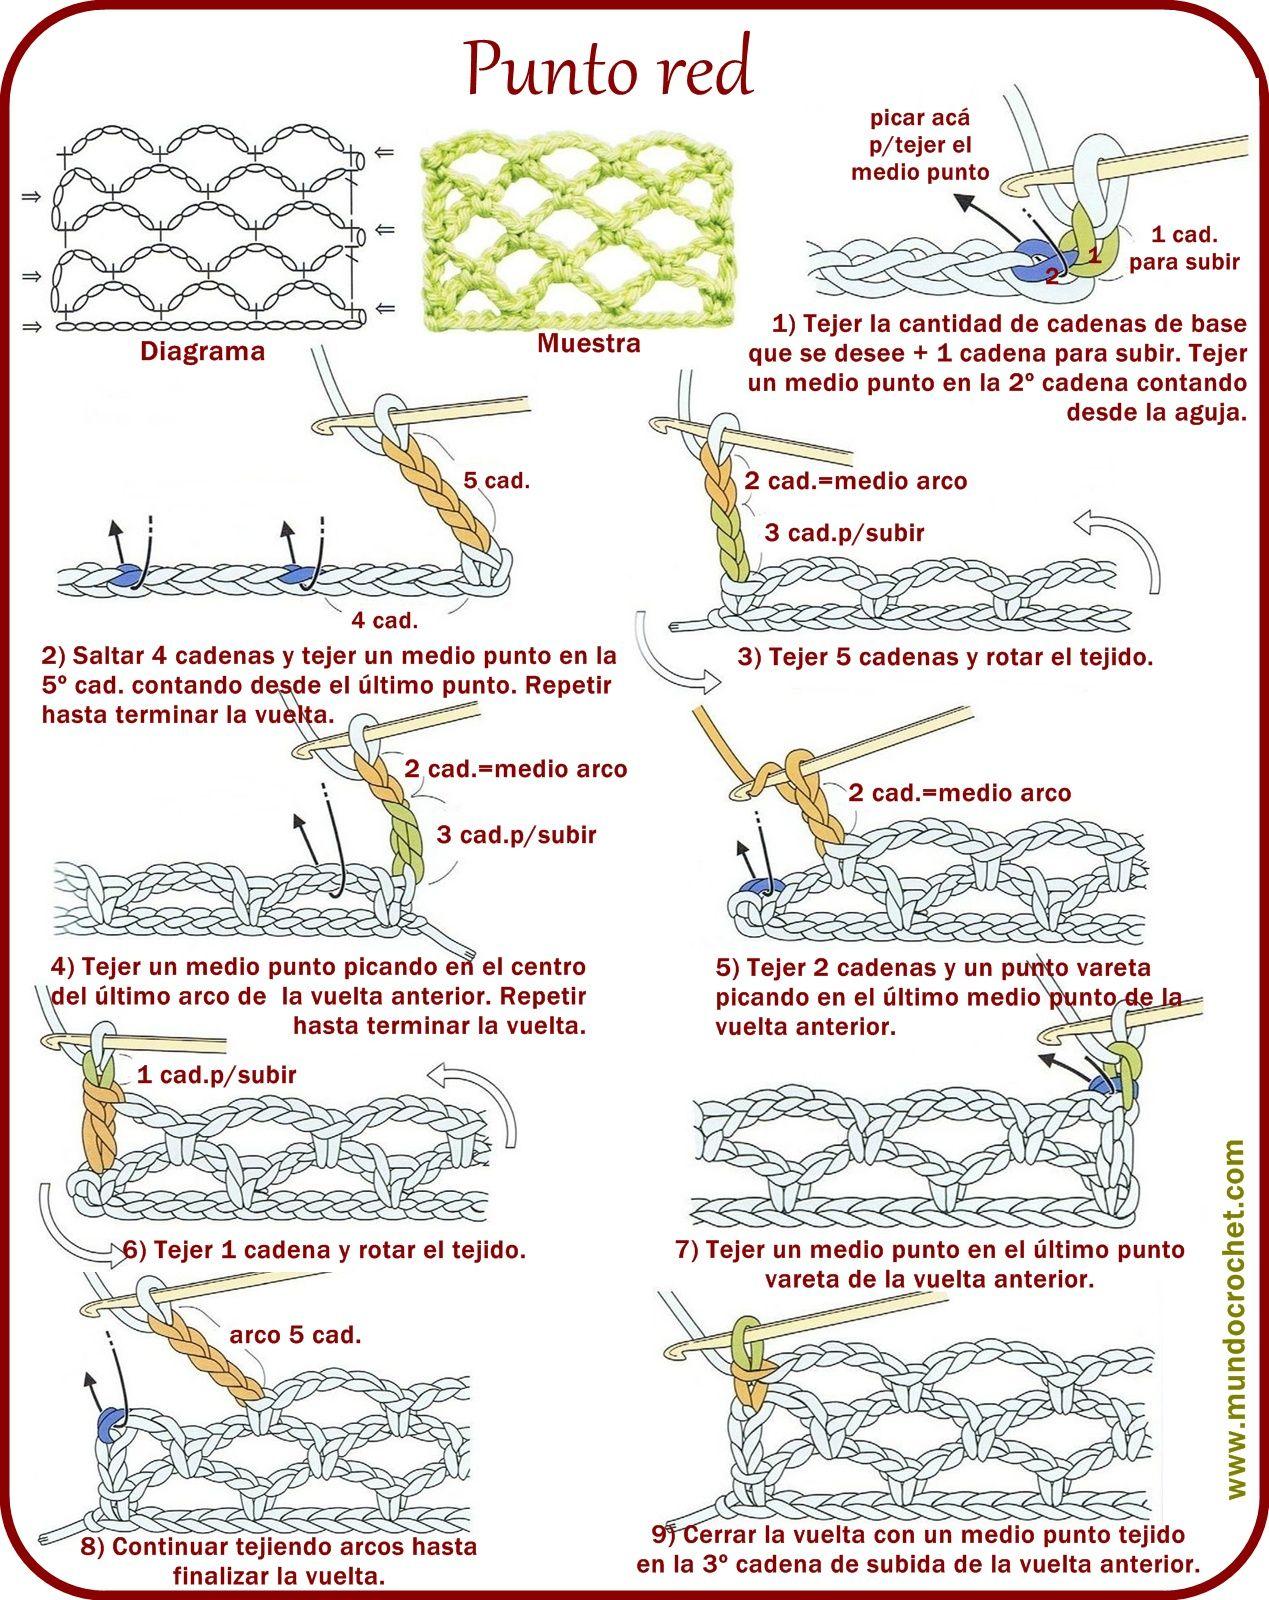 Punto red - Crochet stitch - вязание крючком пунктов | tejido ...